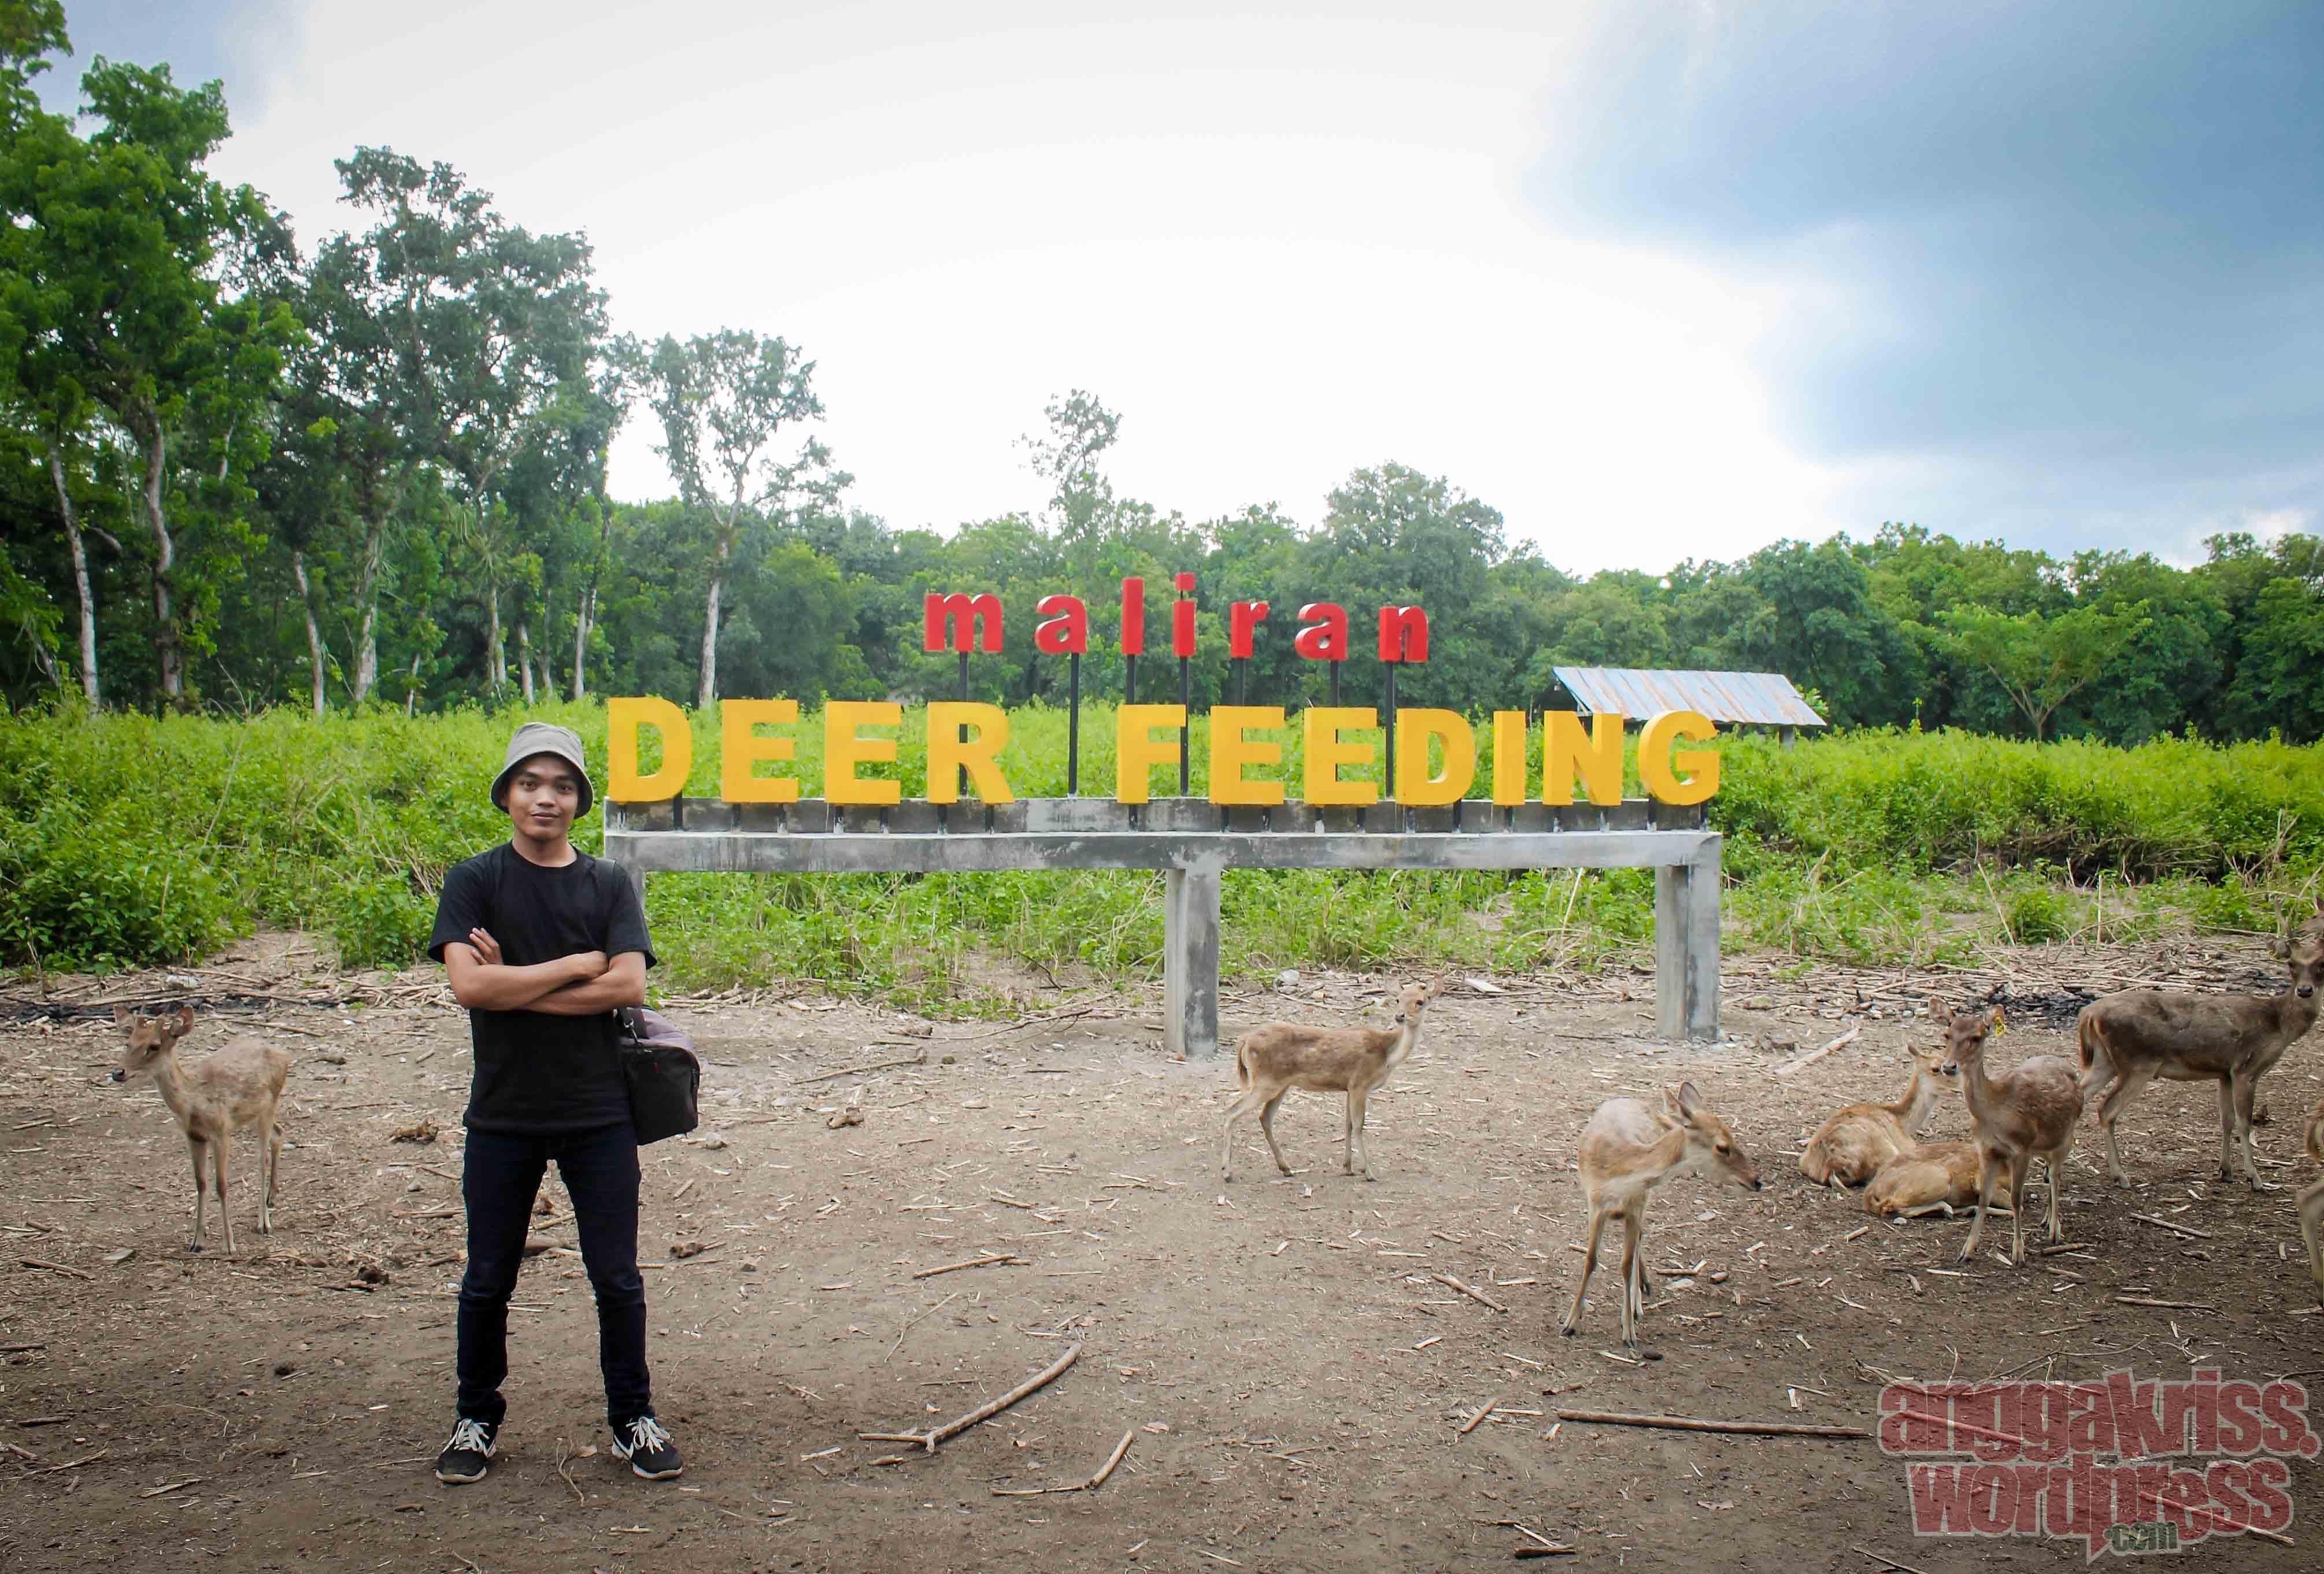 Memanjakan Rusa Maliran Deer Feeding Blitar Anggakris Blog Tiket Masuknya